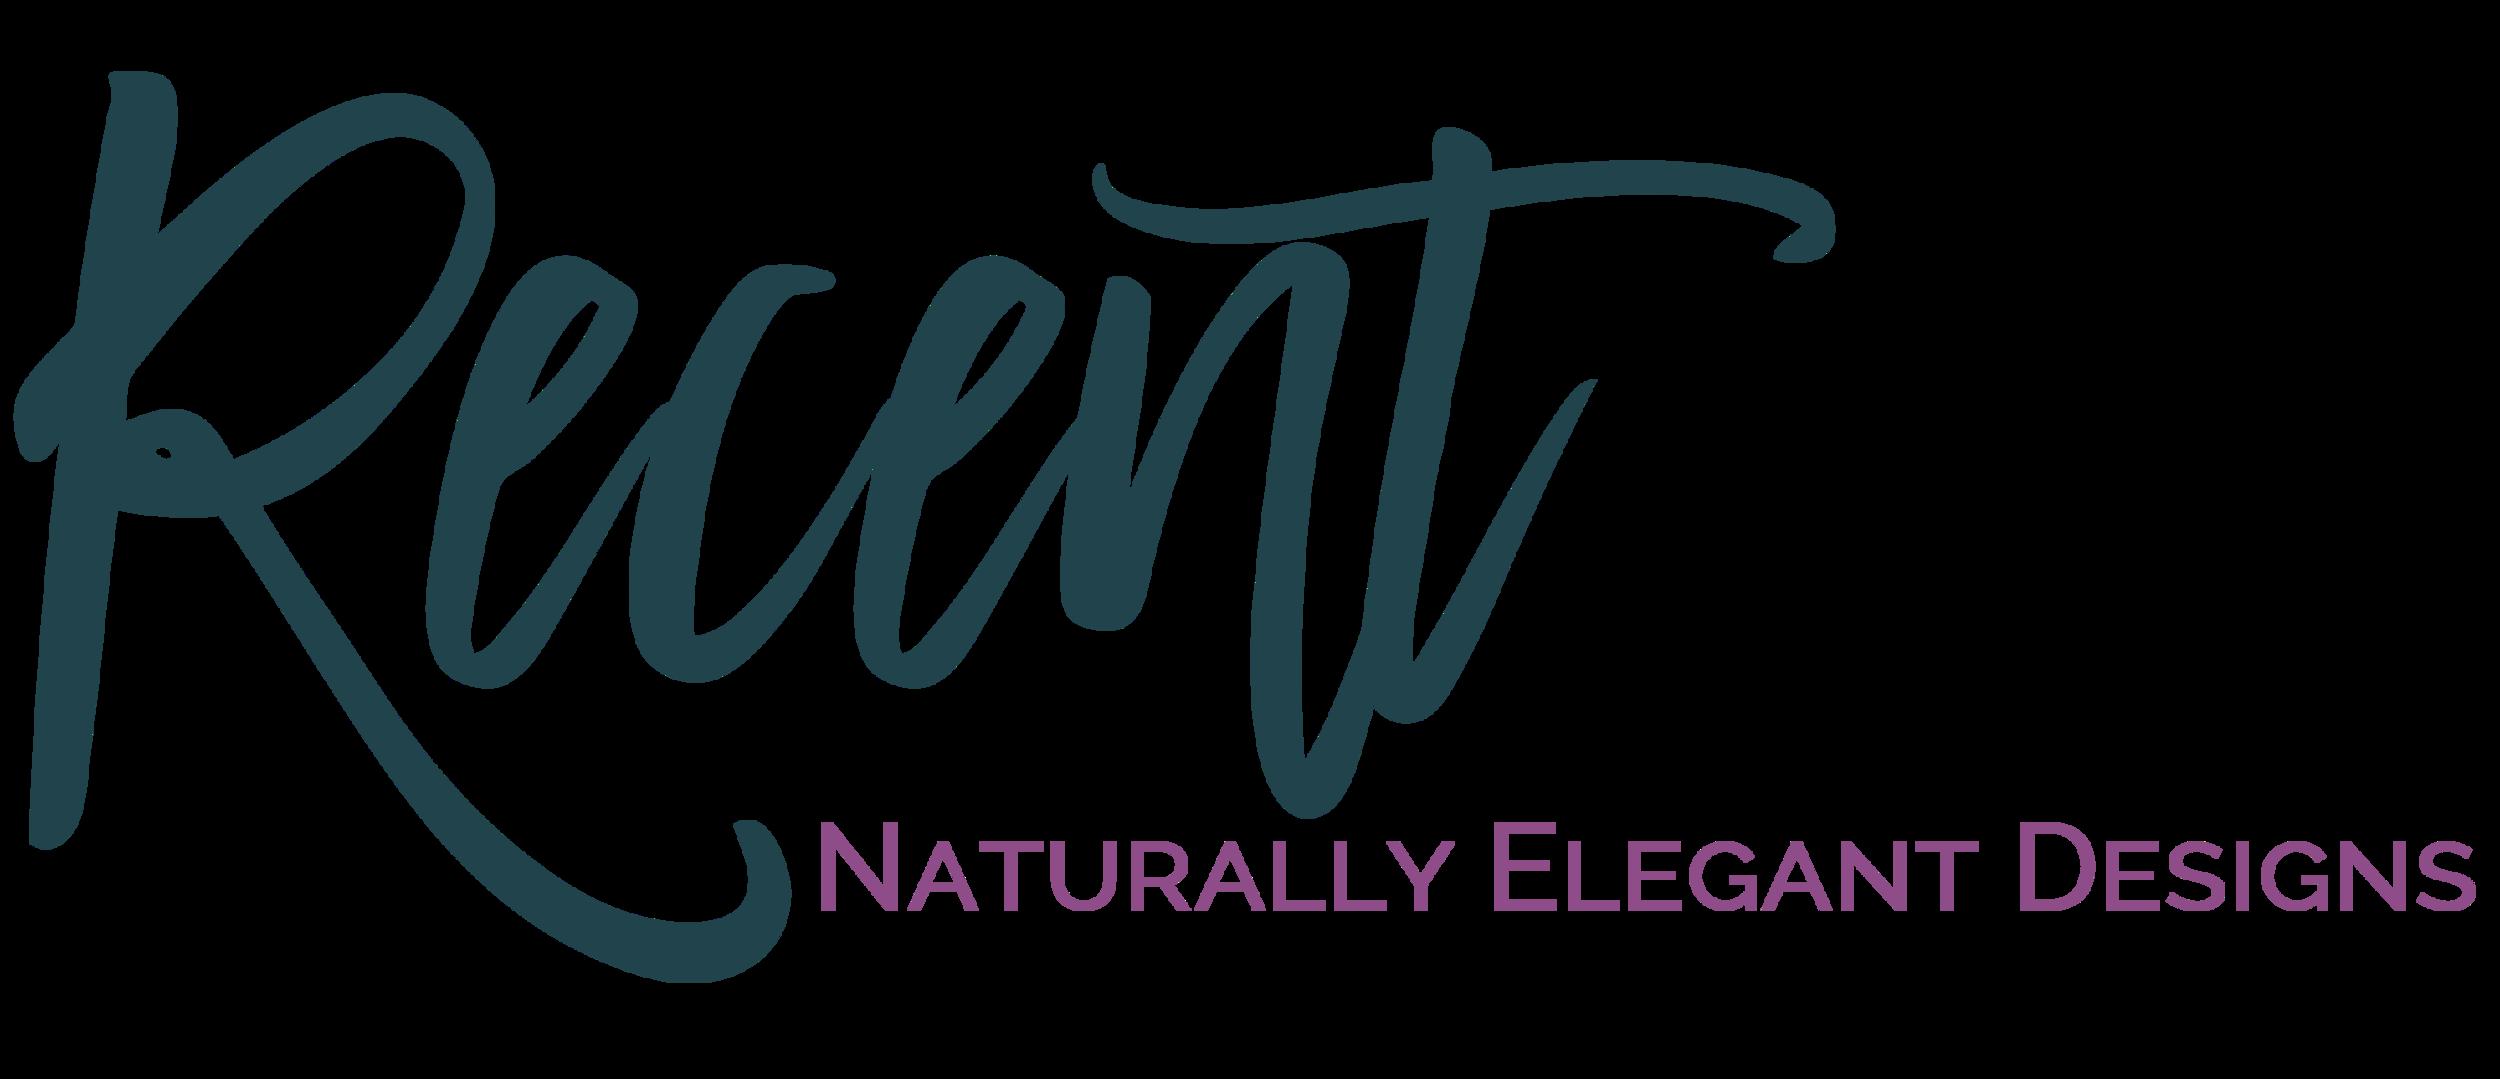 Recent Naturally Elegant Designs